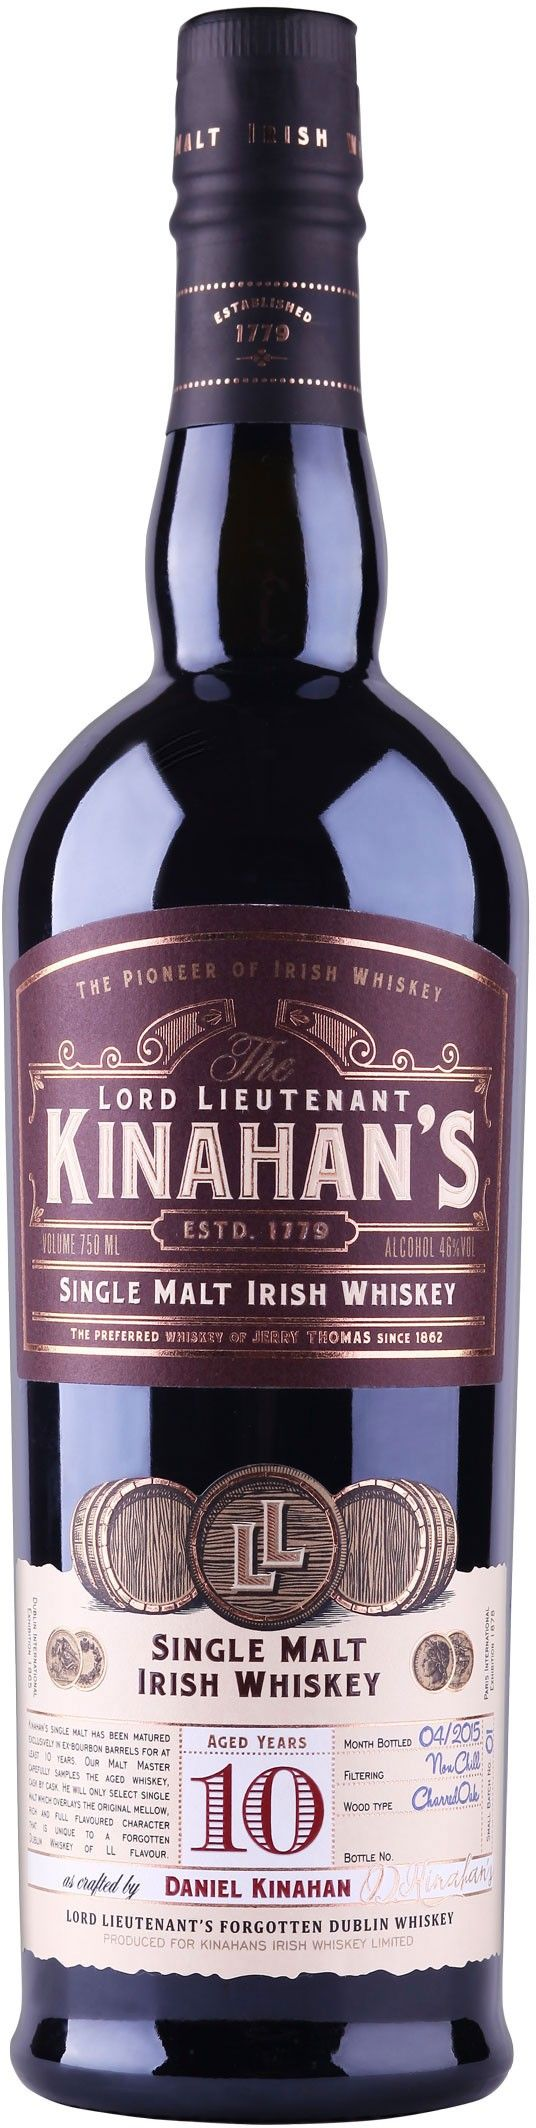 Kinahan's 10 Year Old Single Malt Irish Whiskey | @Caskers